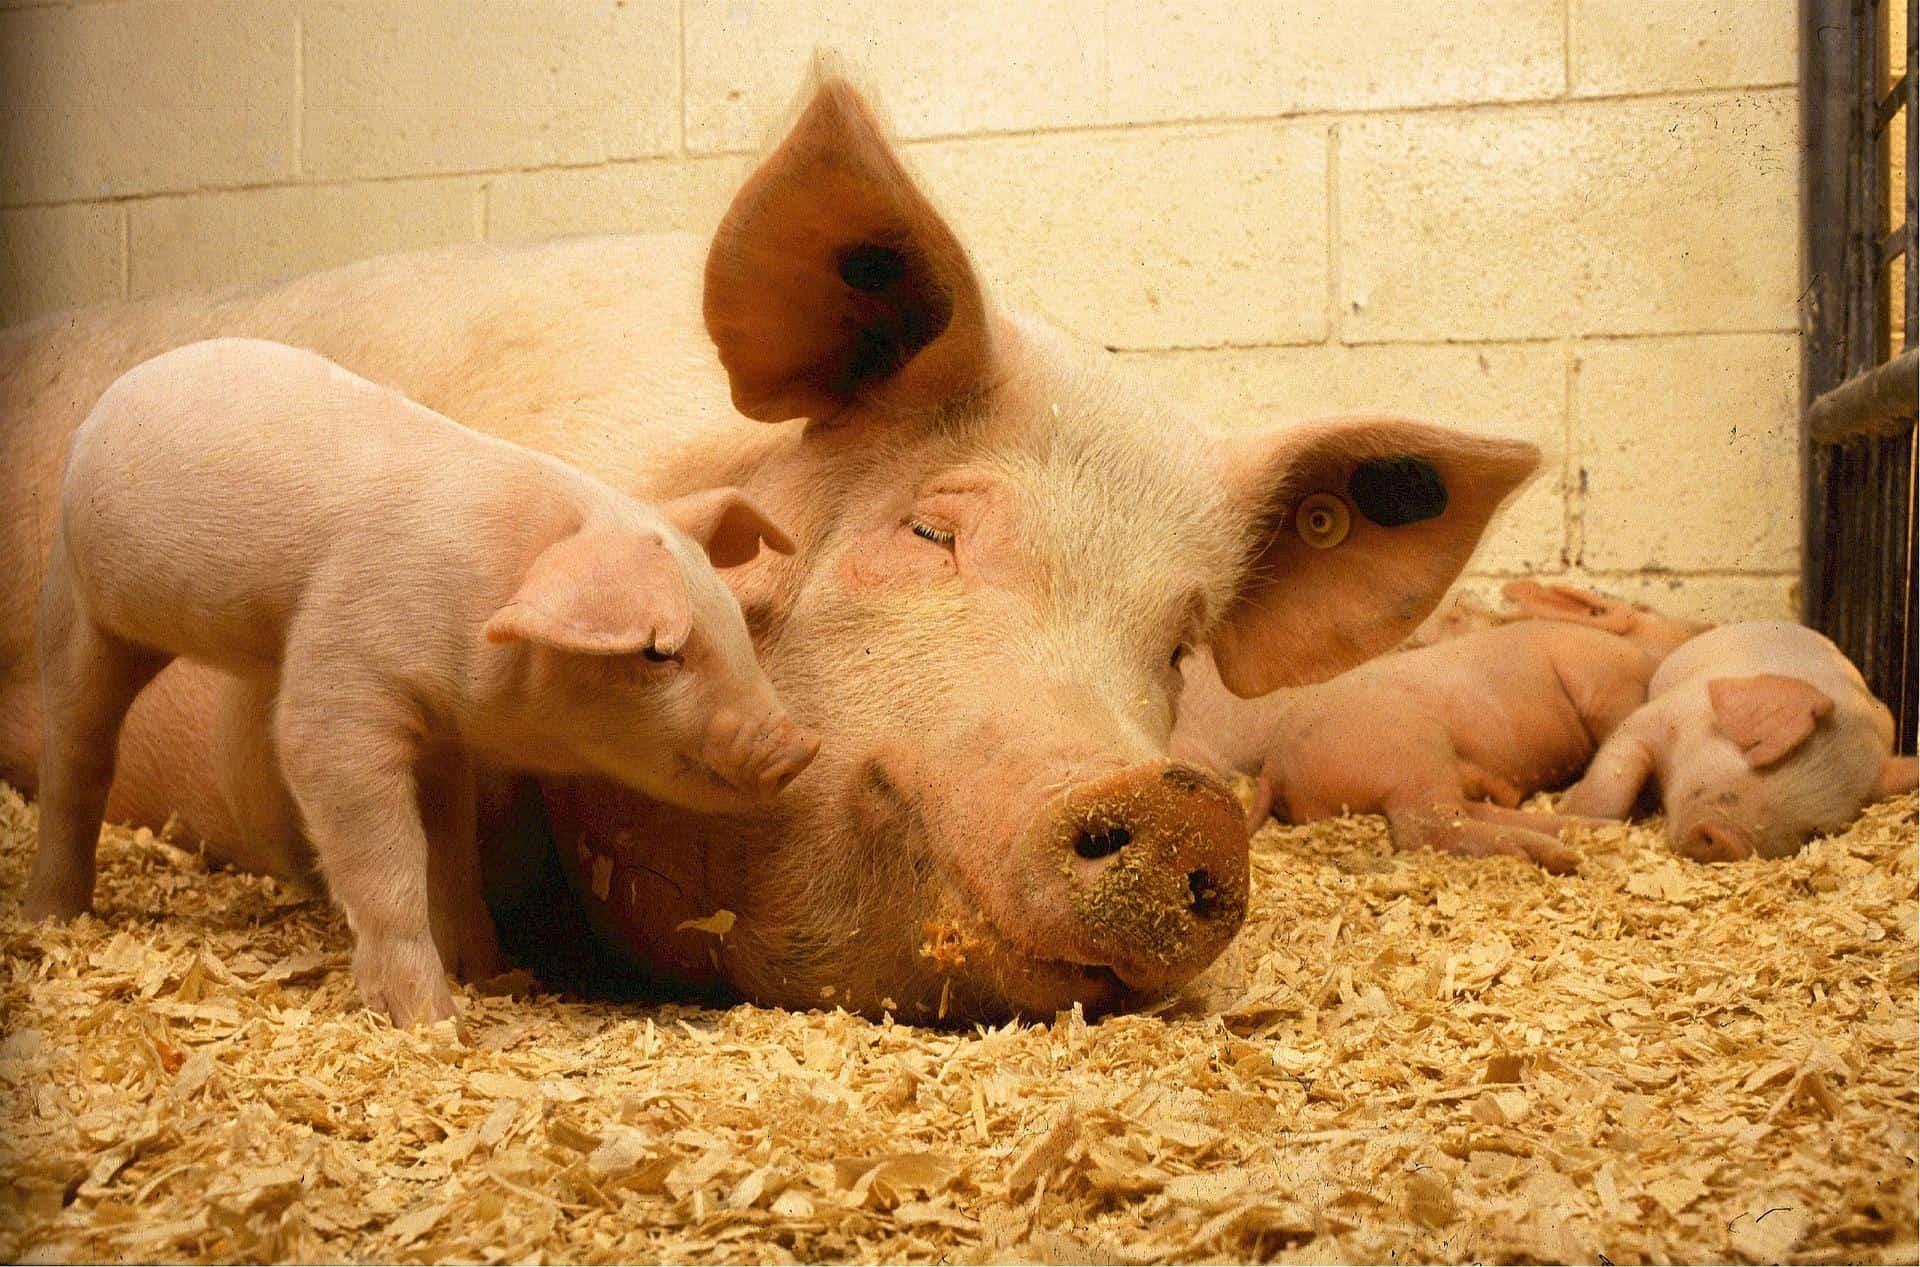 pigs 520896 1920 - AgroEcosun